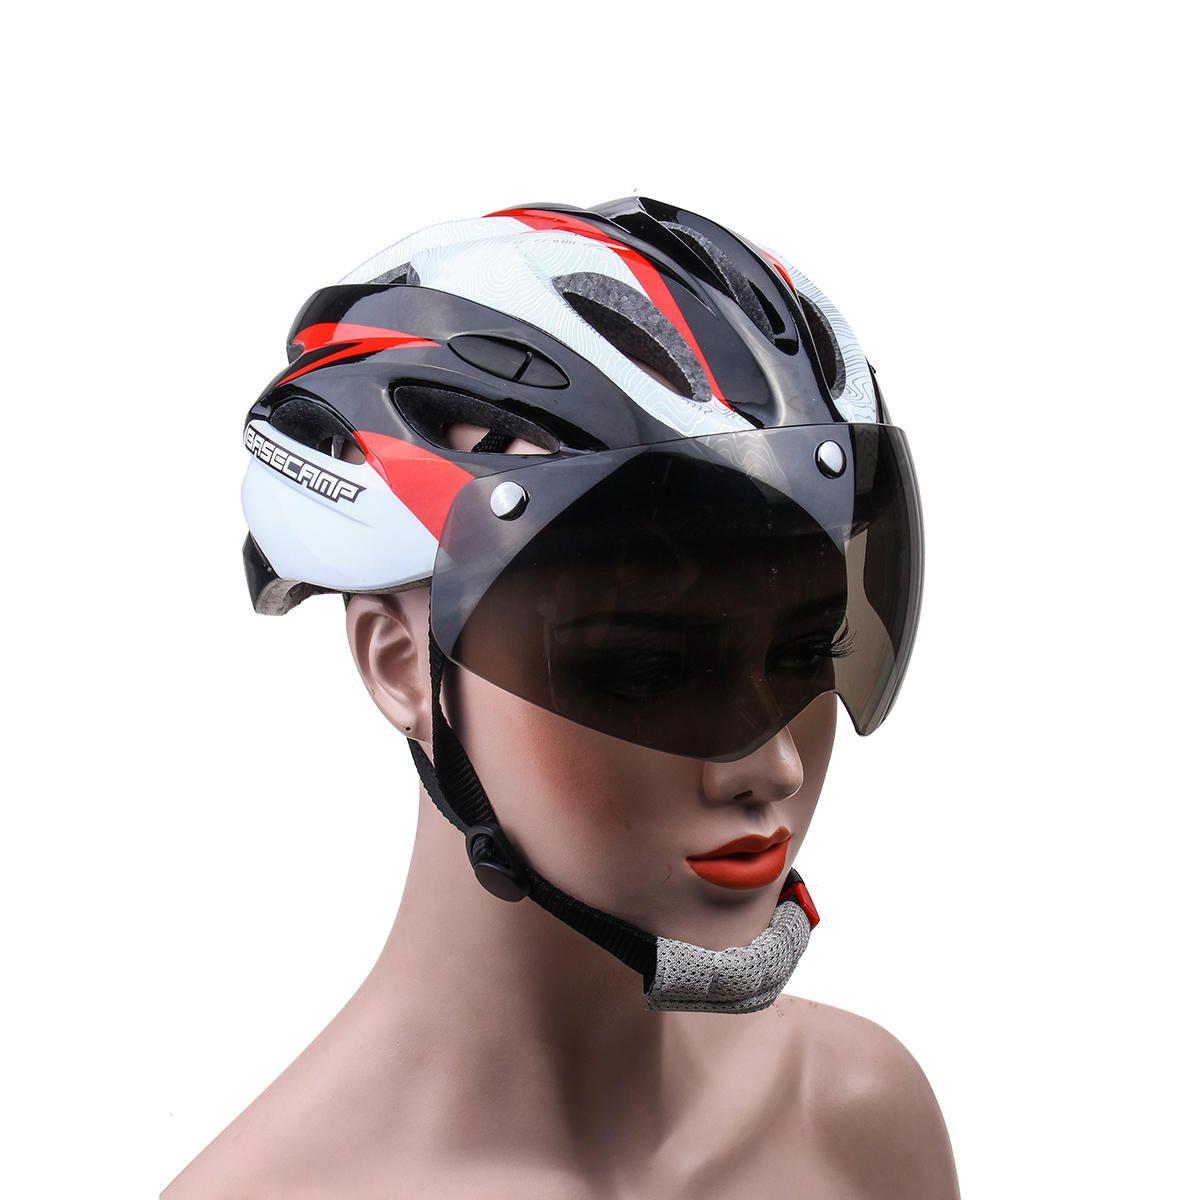 Basecamp Goggles Visor Bicycle Helmet Road Cycling Mountain Bike